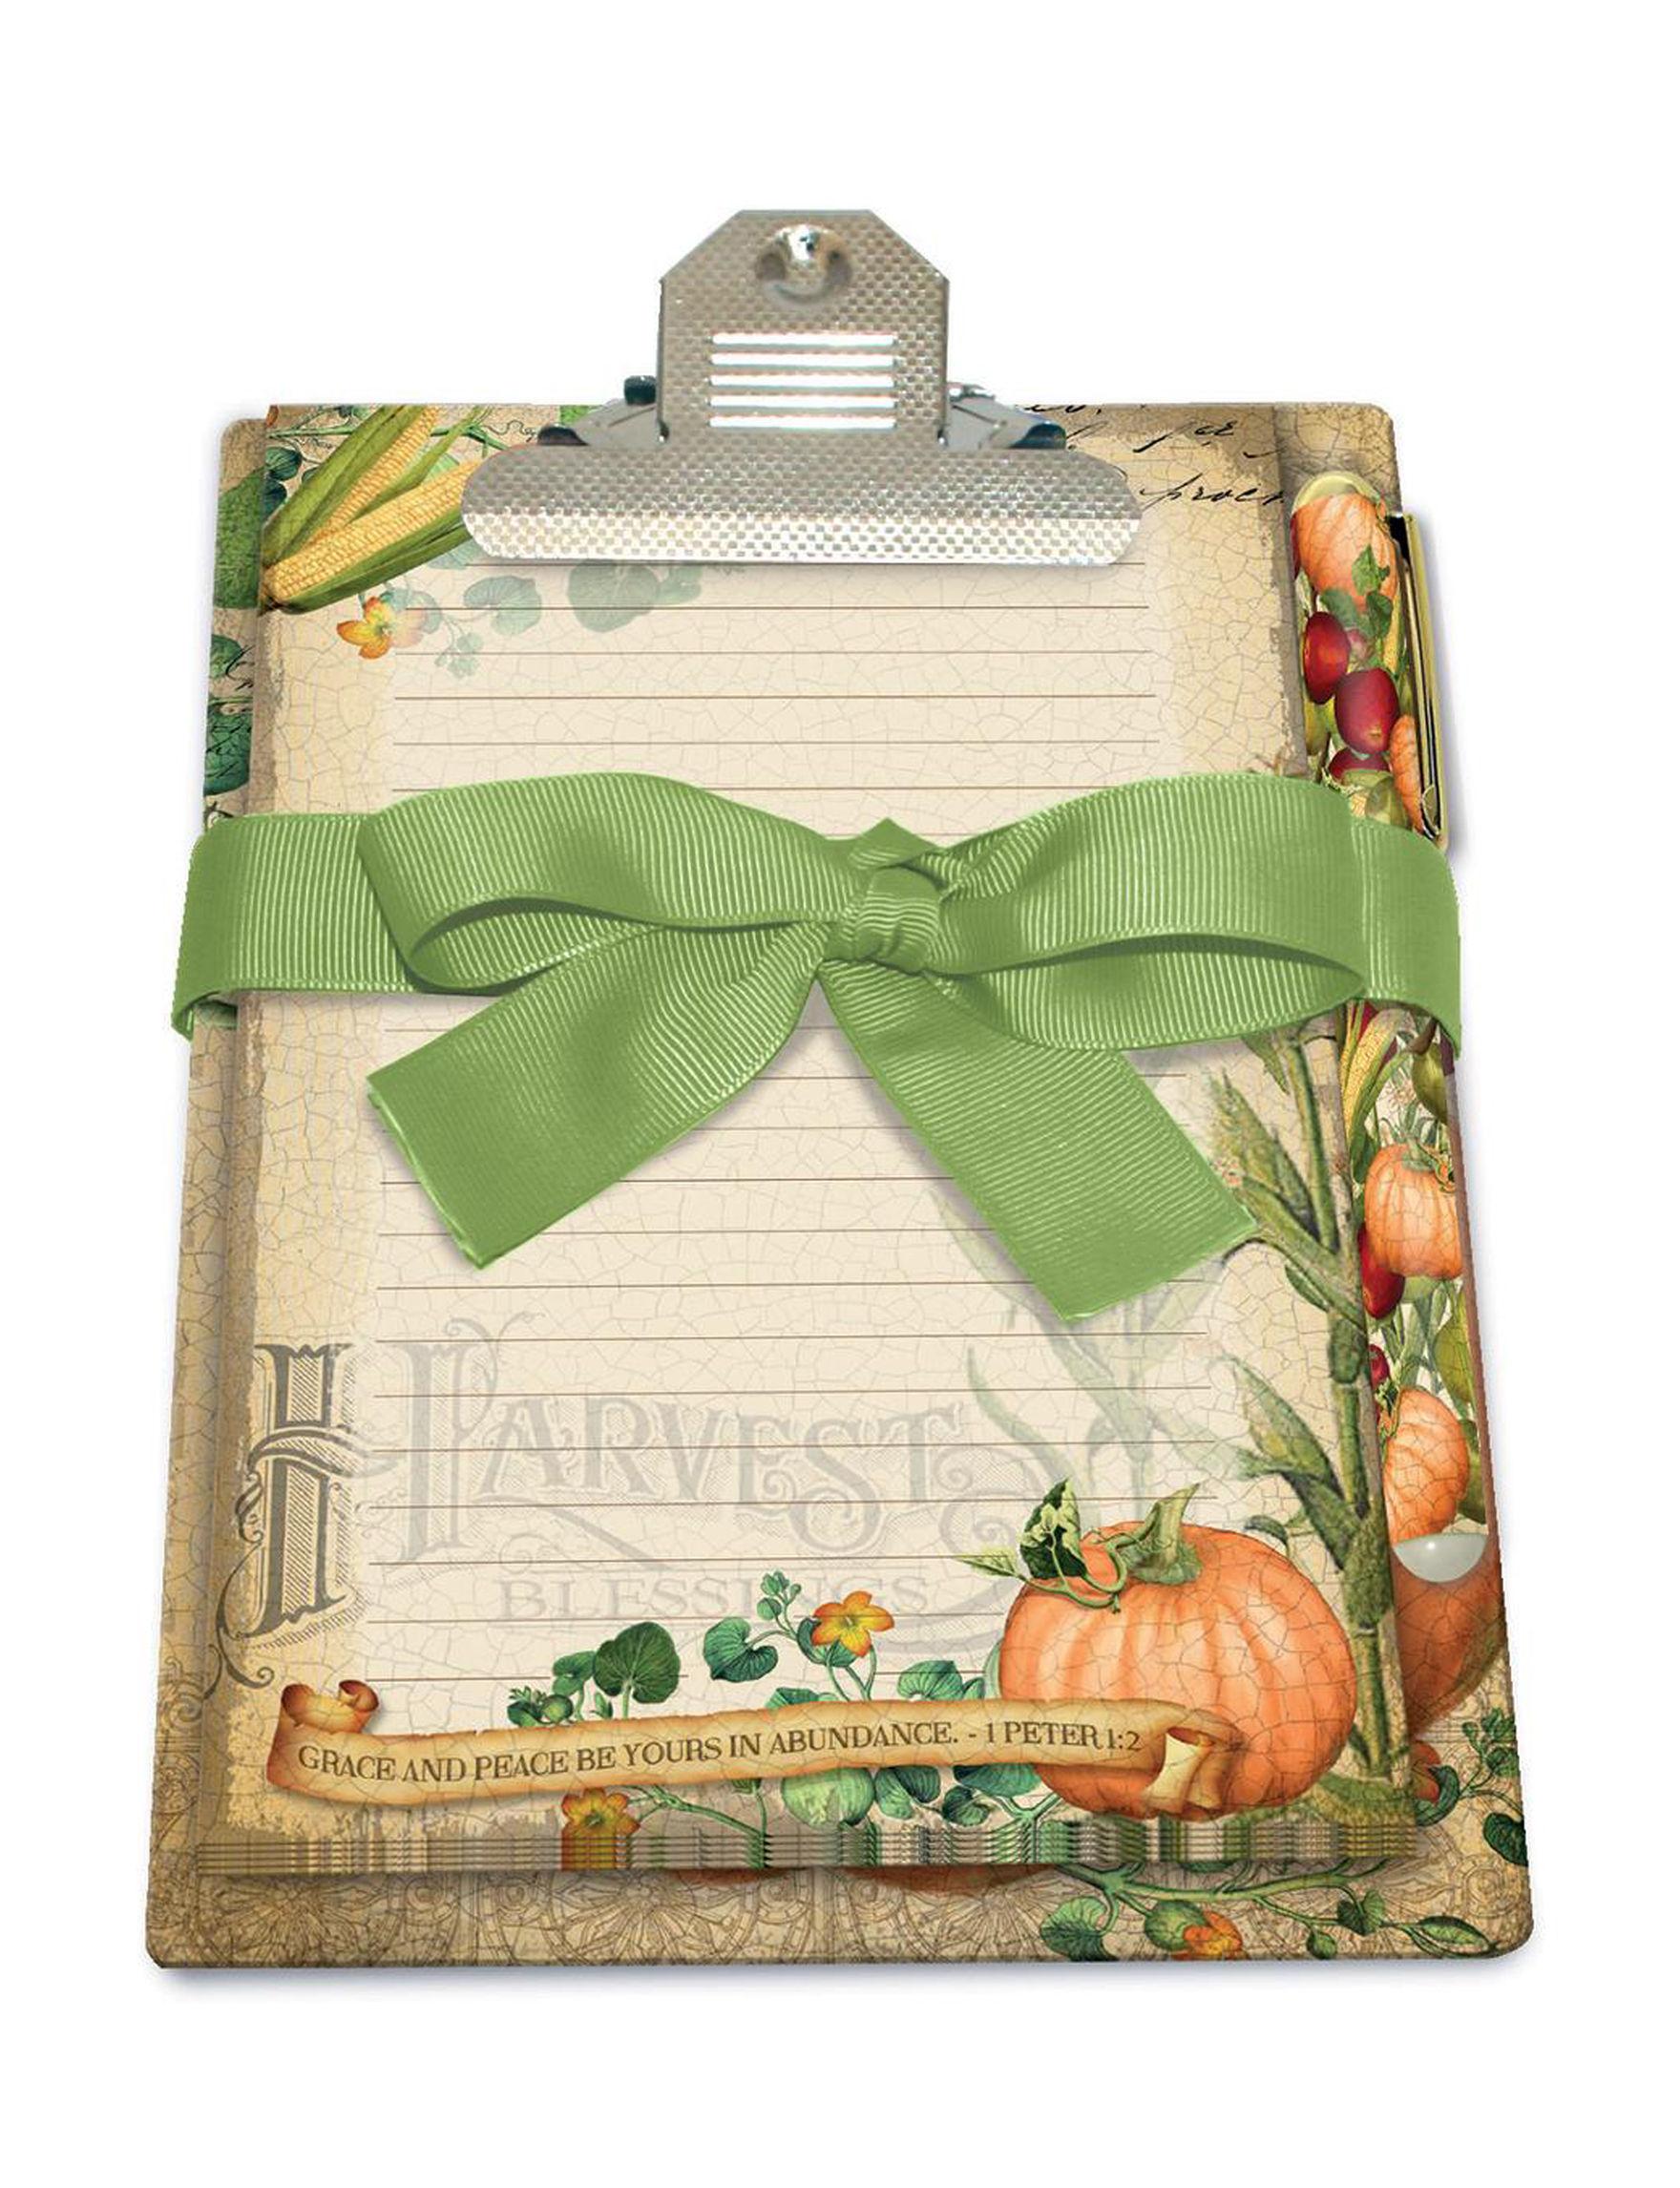 Divinity Green / Multi Journals & Notepads School & Office Supplies